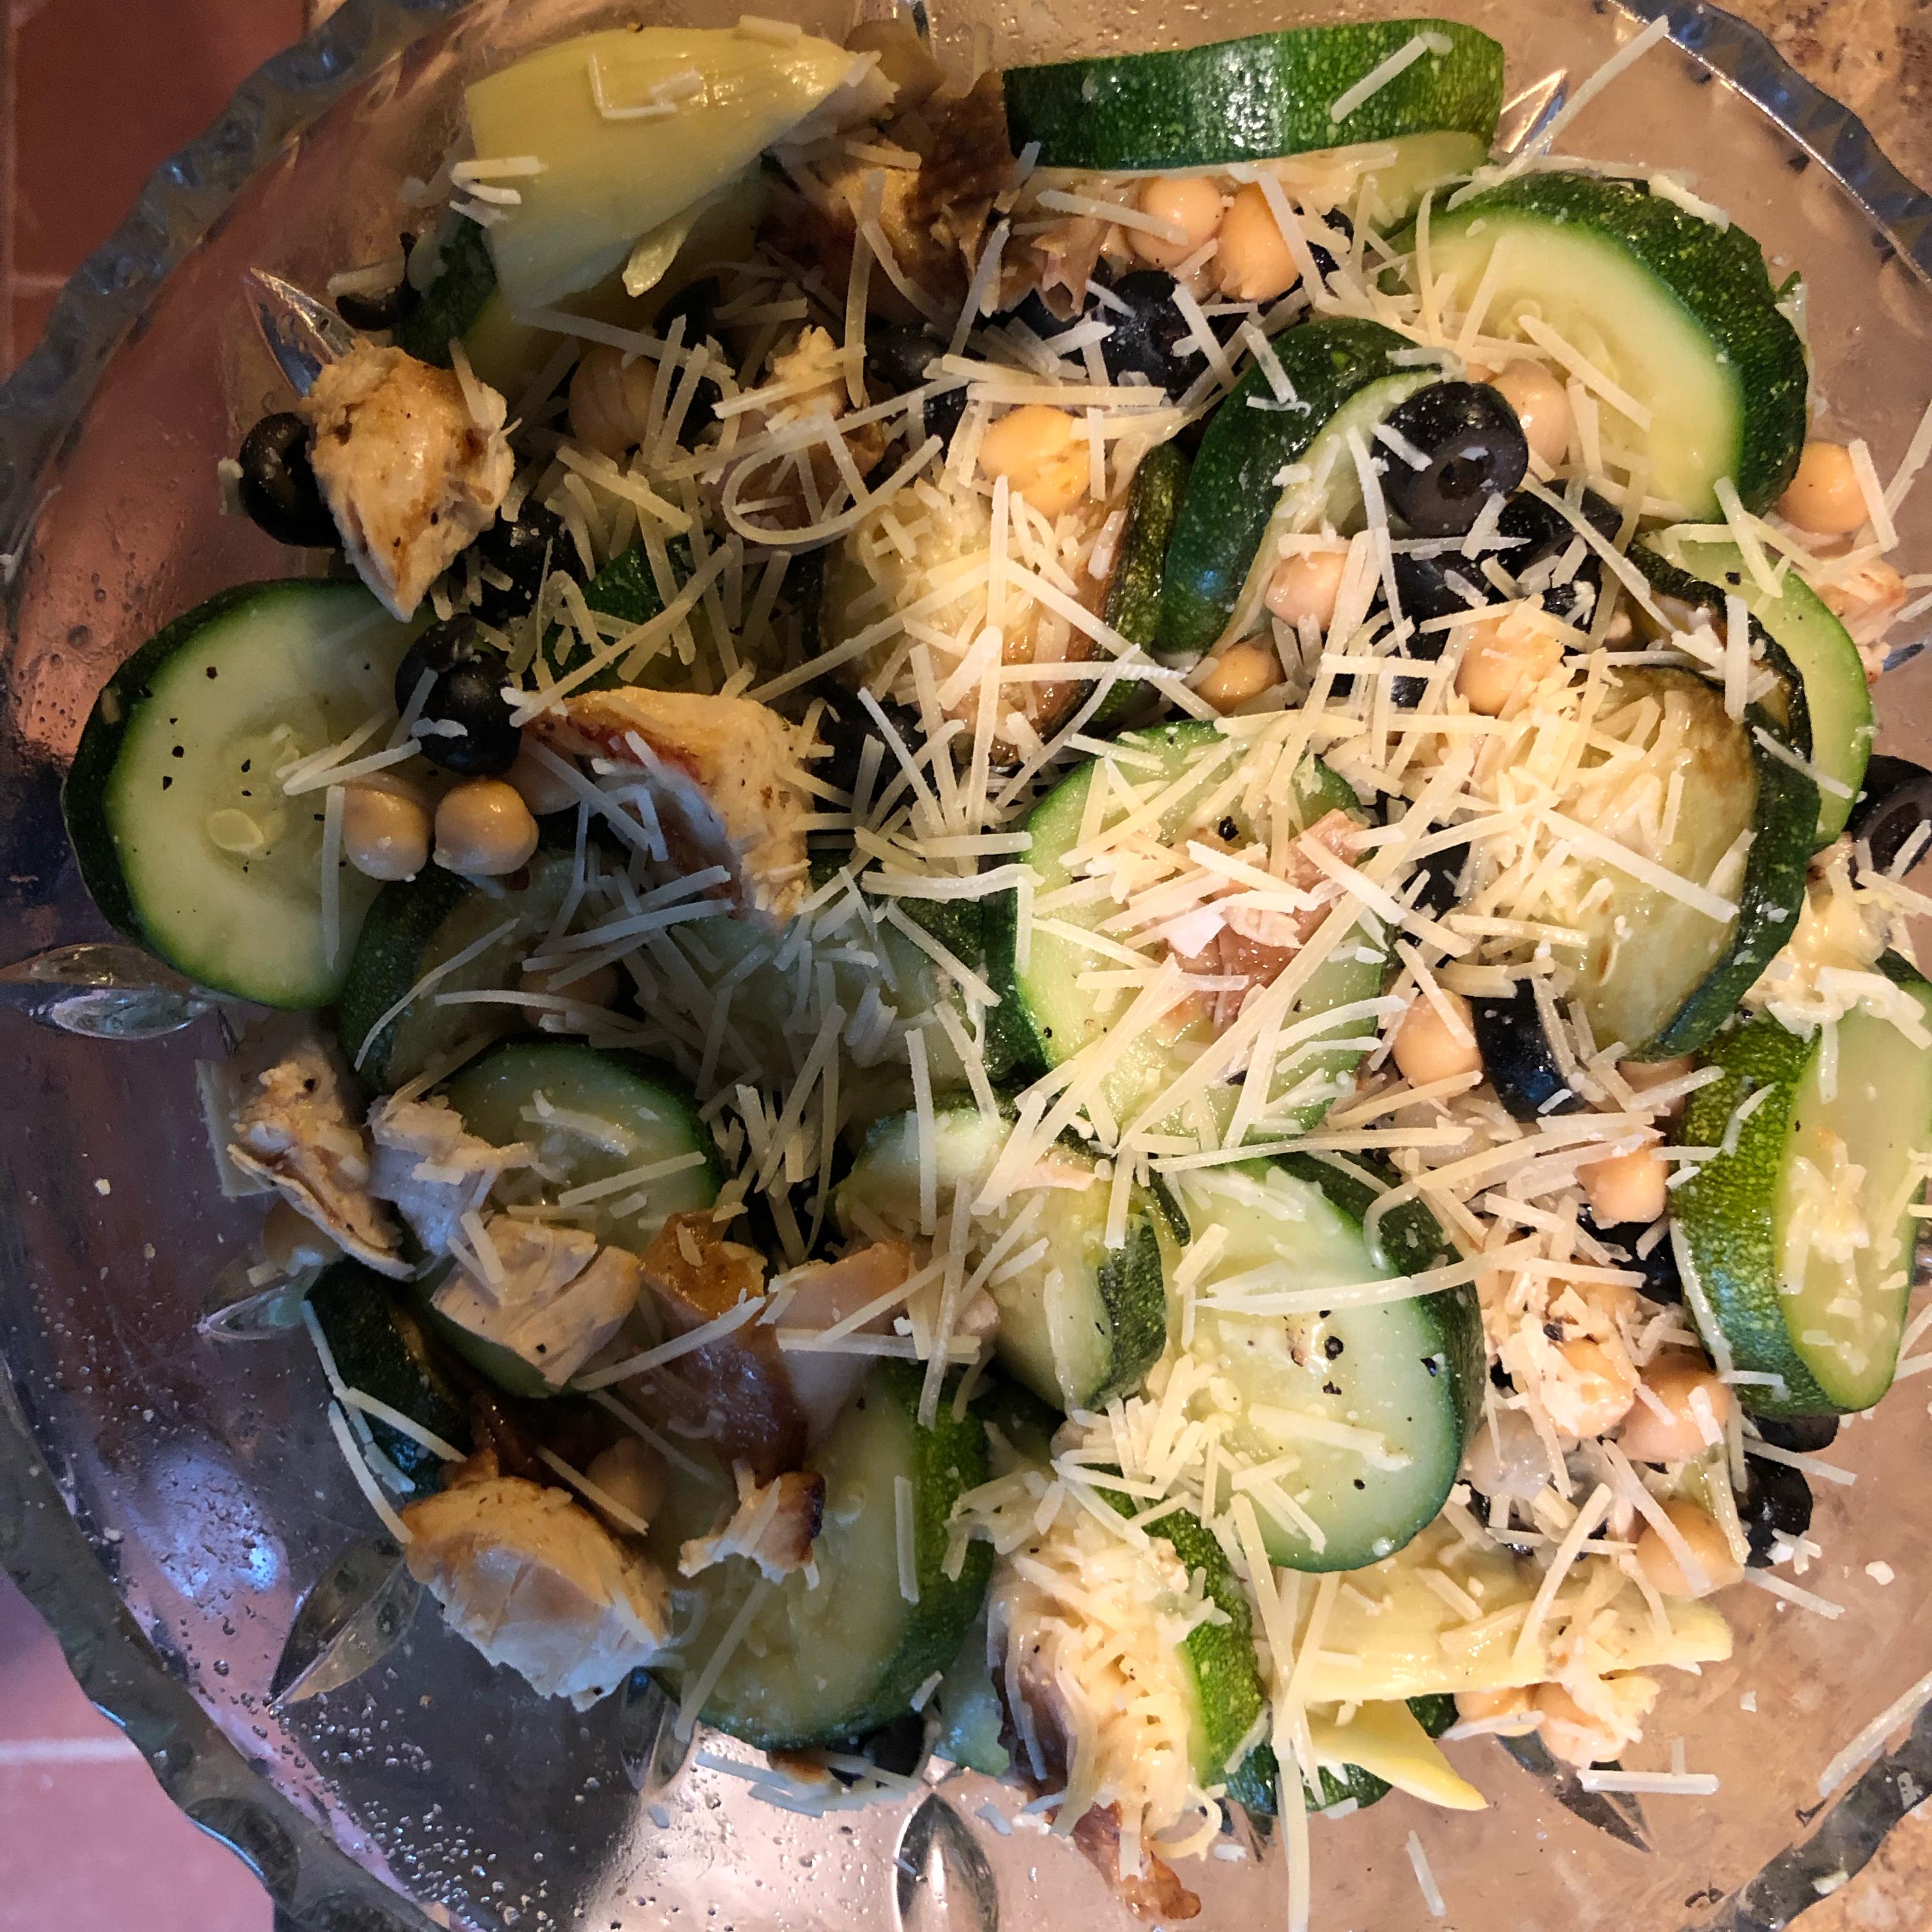 Zucchini Artichoke Summer Salad lizmc2006